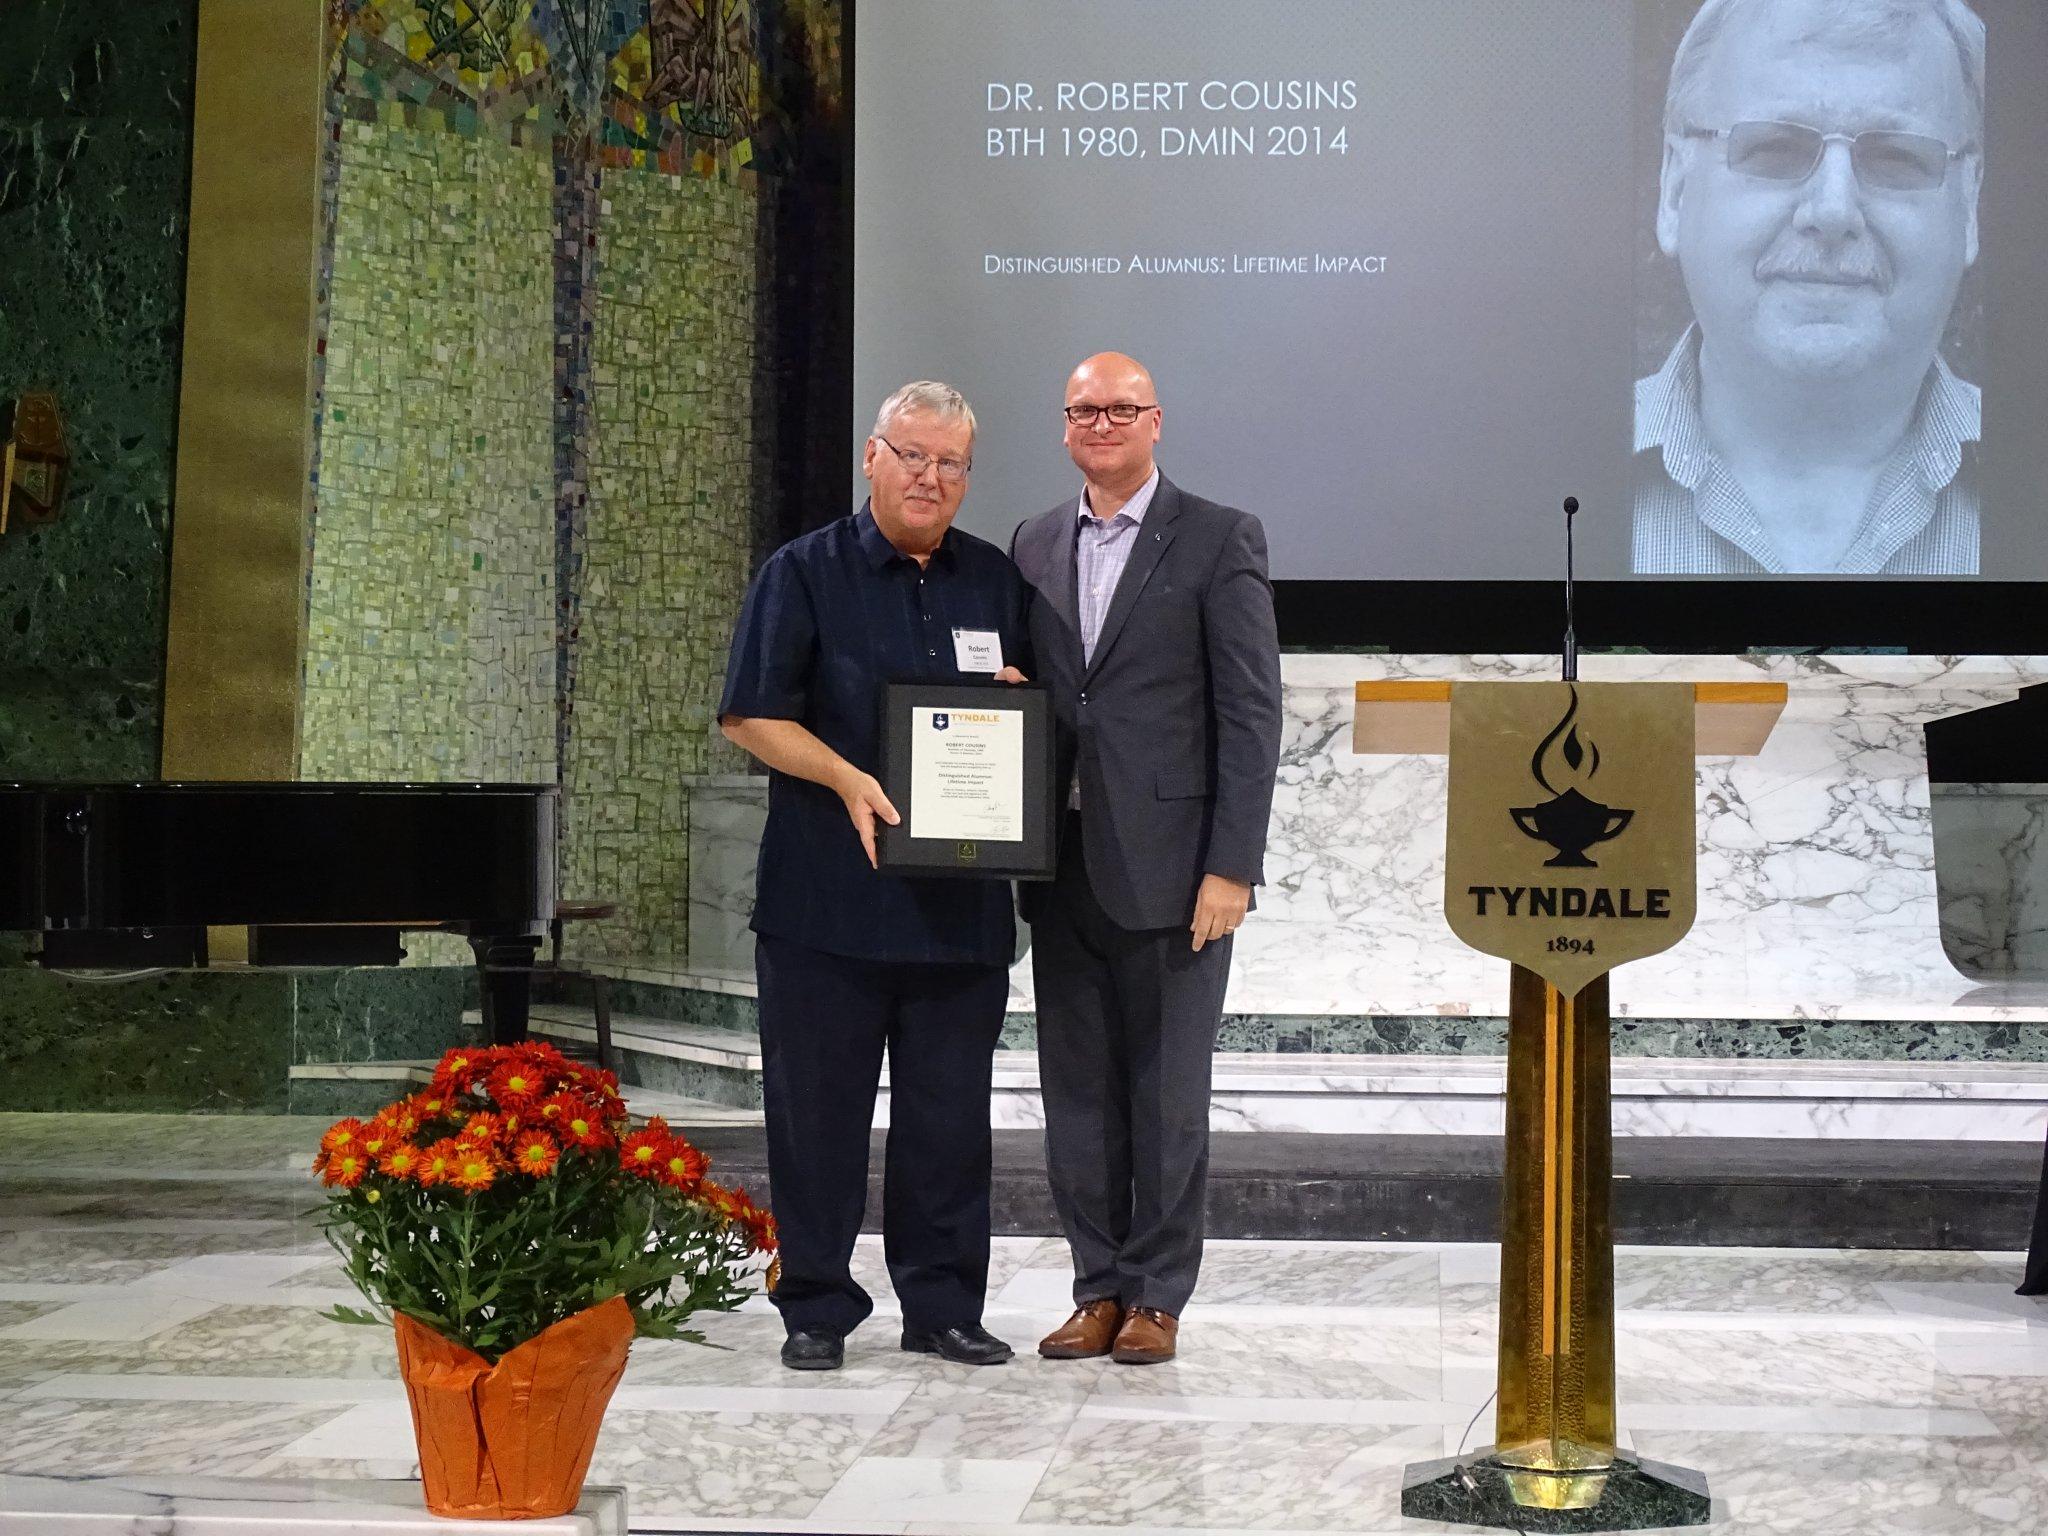 Distinguished Alumni: Dr. Robert Cousins